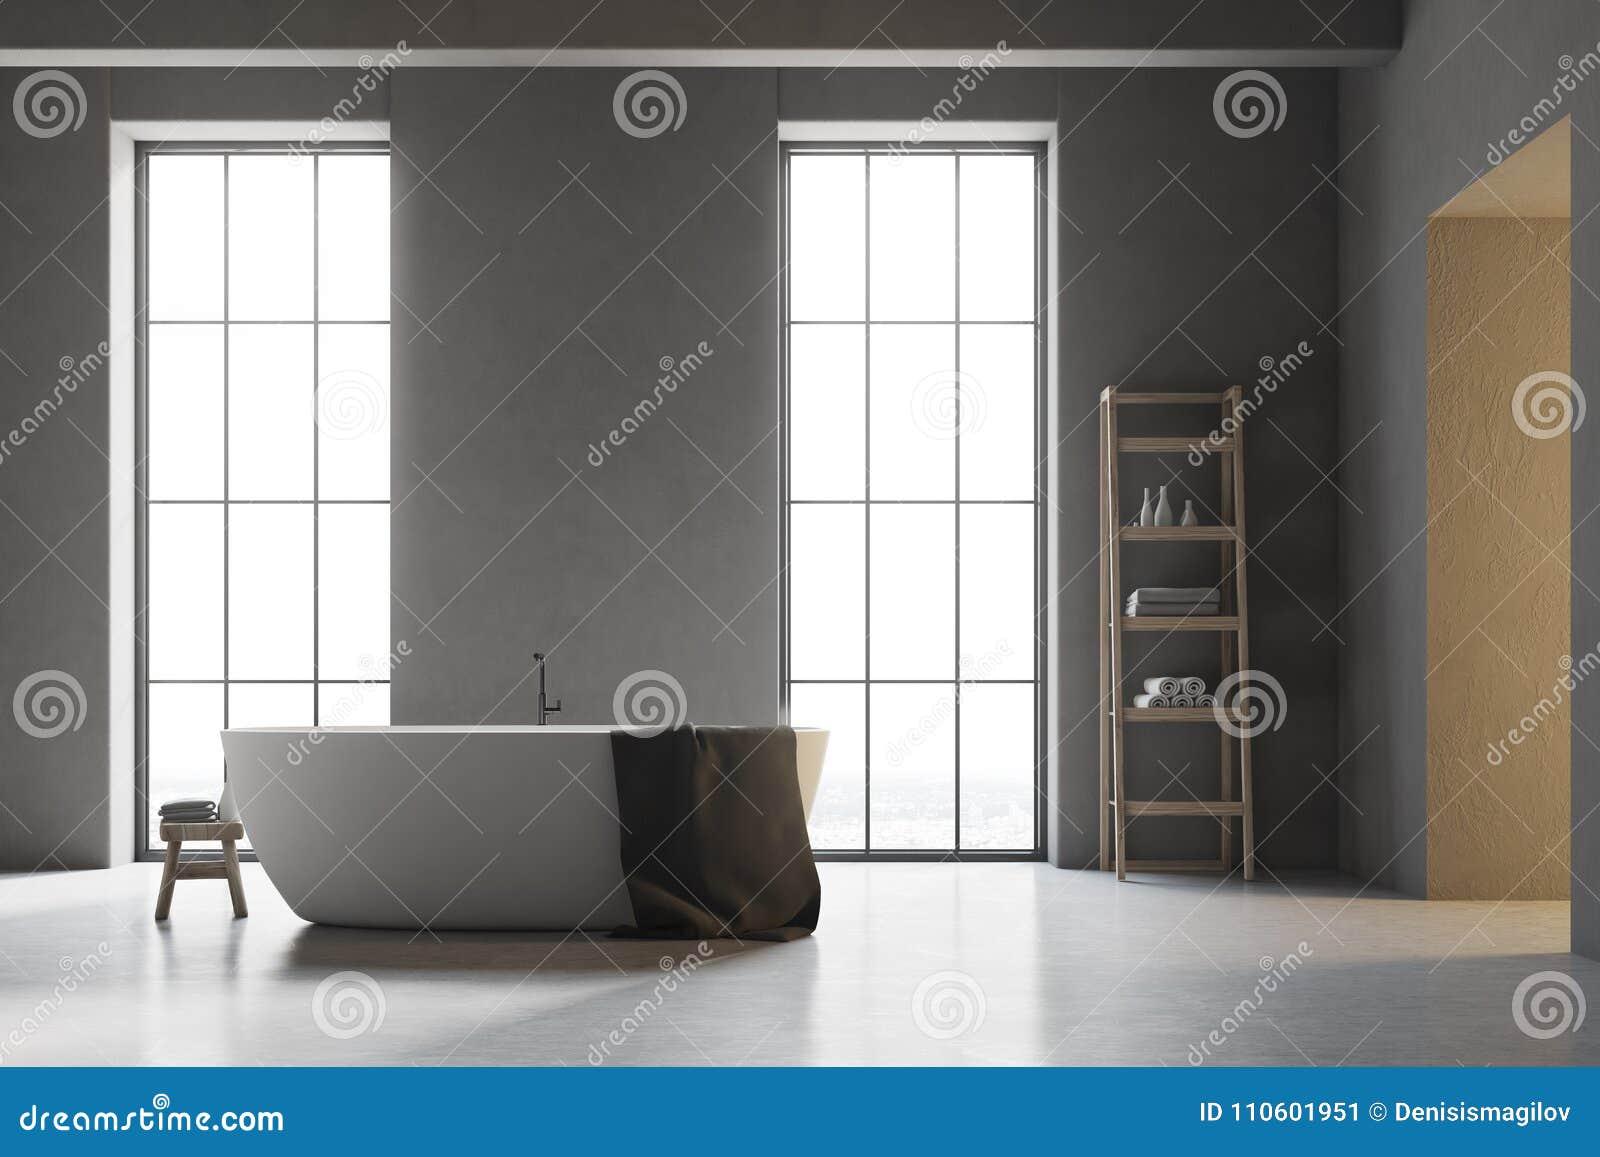 Pavimento Bianco Grigio : Vasca bianca in un bagno grigio con il pavimento bianco